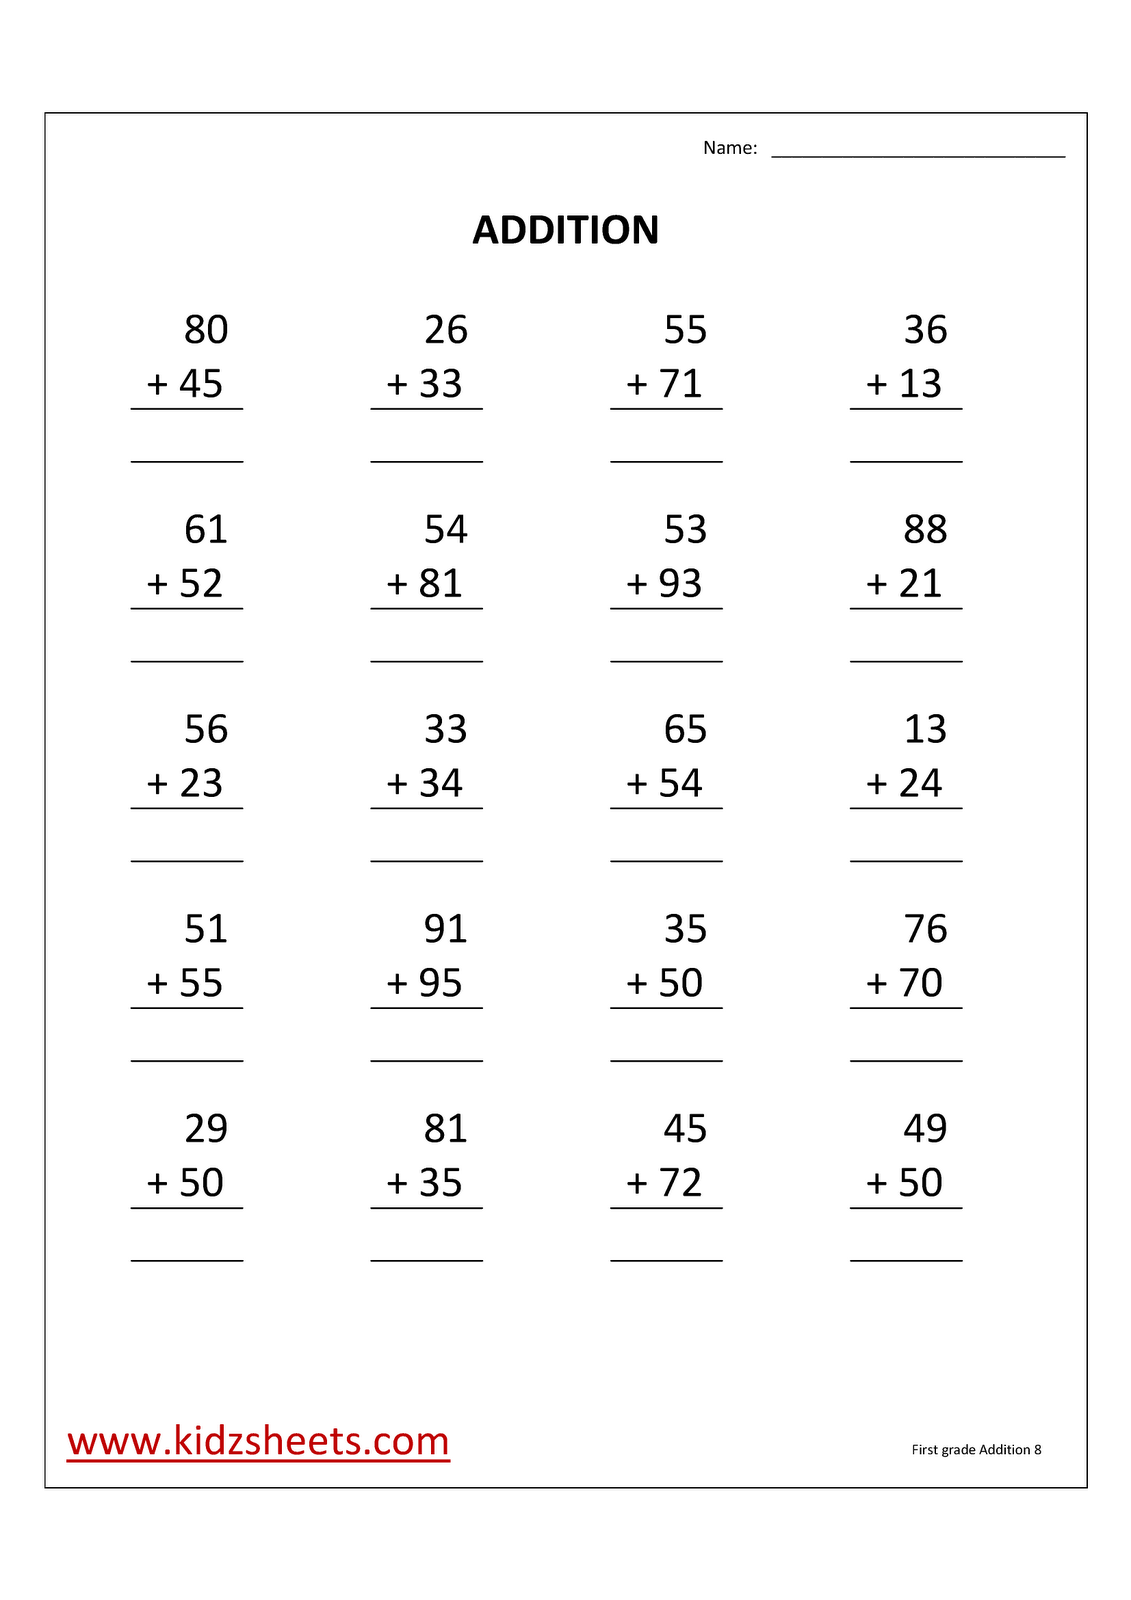 medium resolution of Kidz Worksheets: First Grade Addition Worksheet8